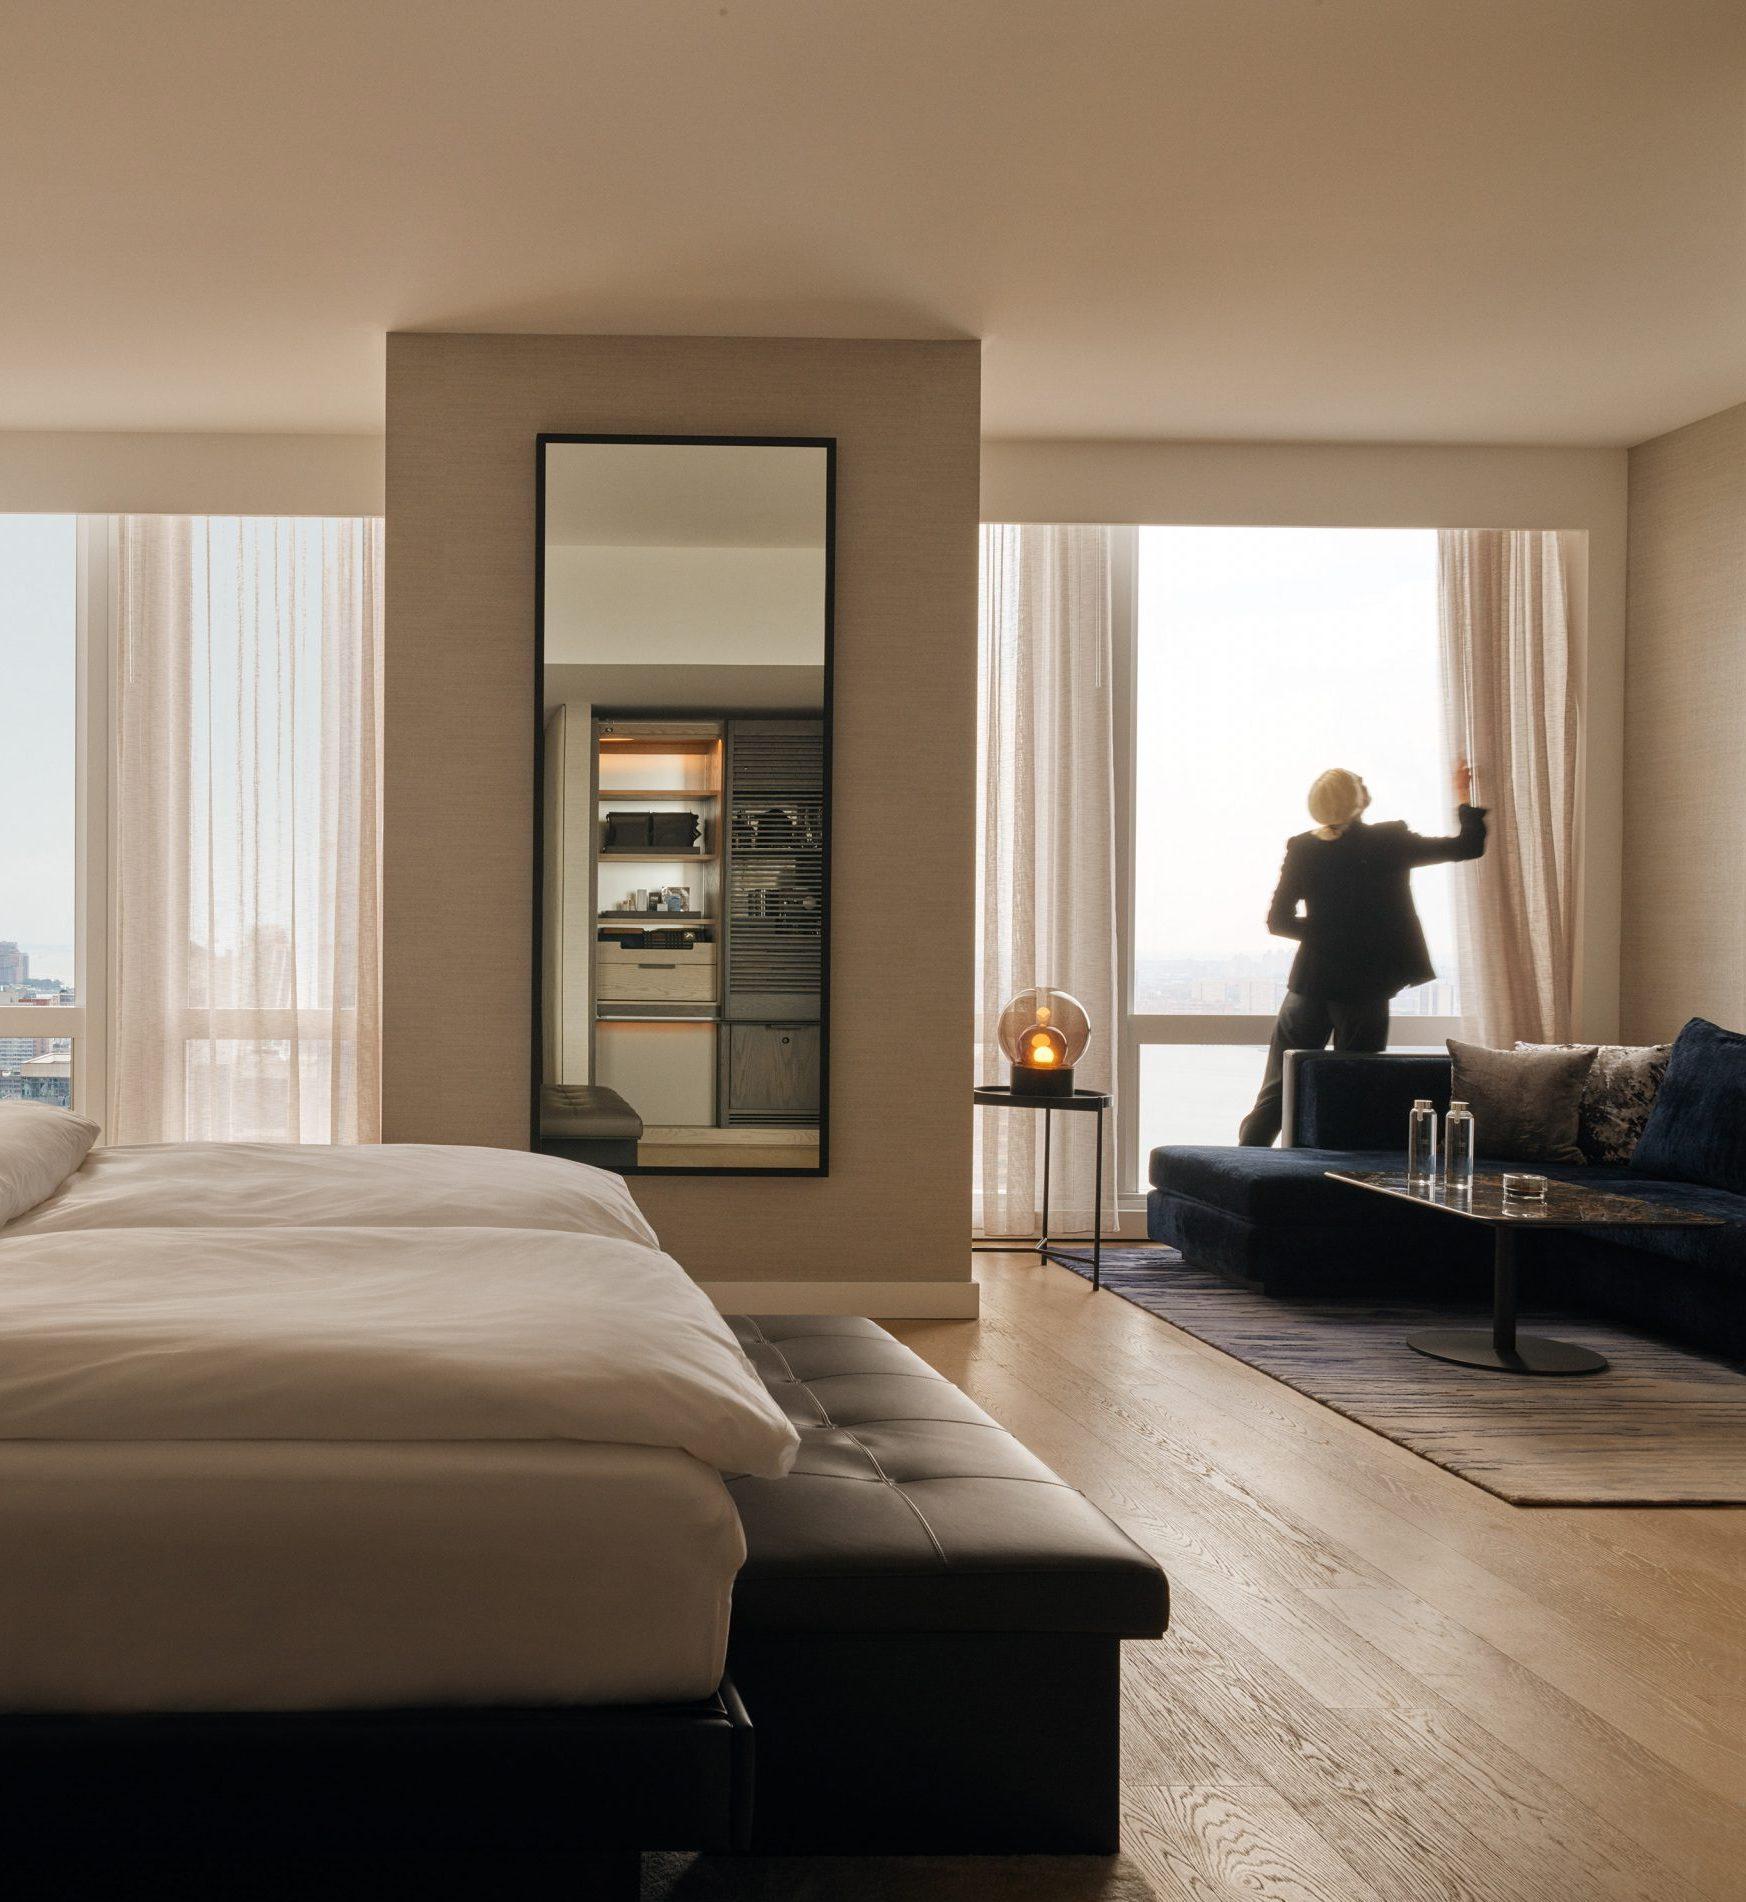 <equinox hotel premier king room